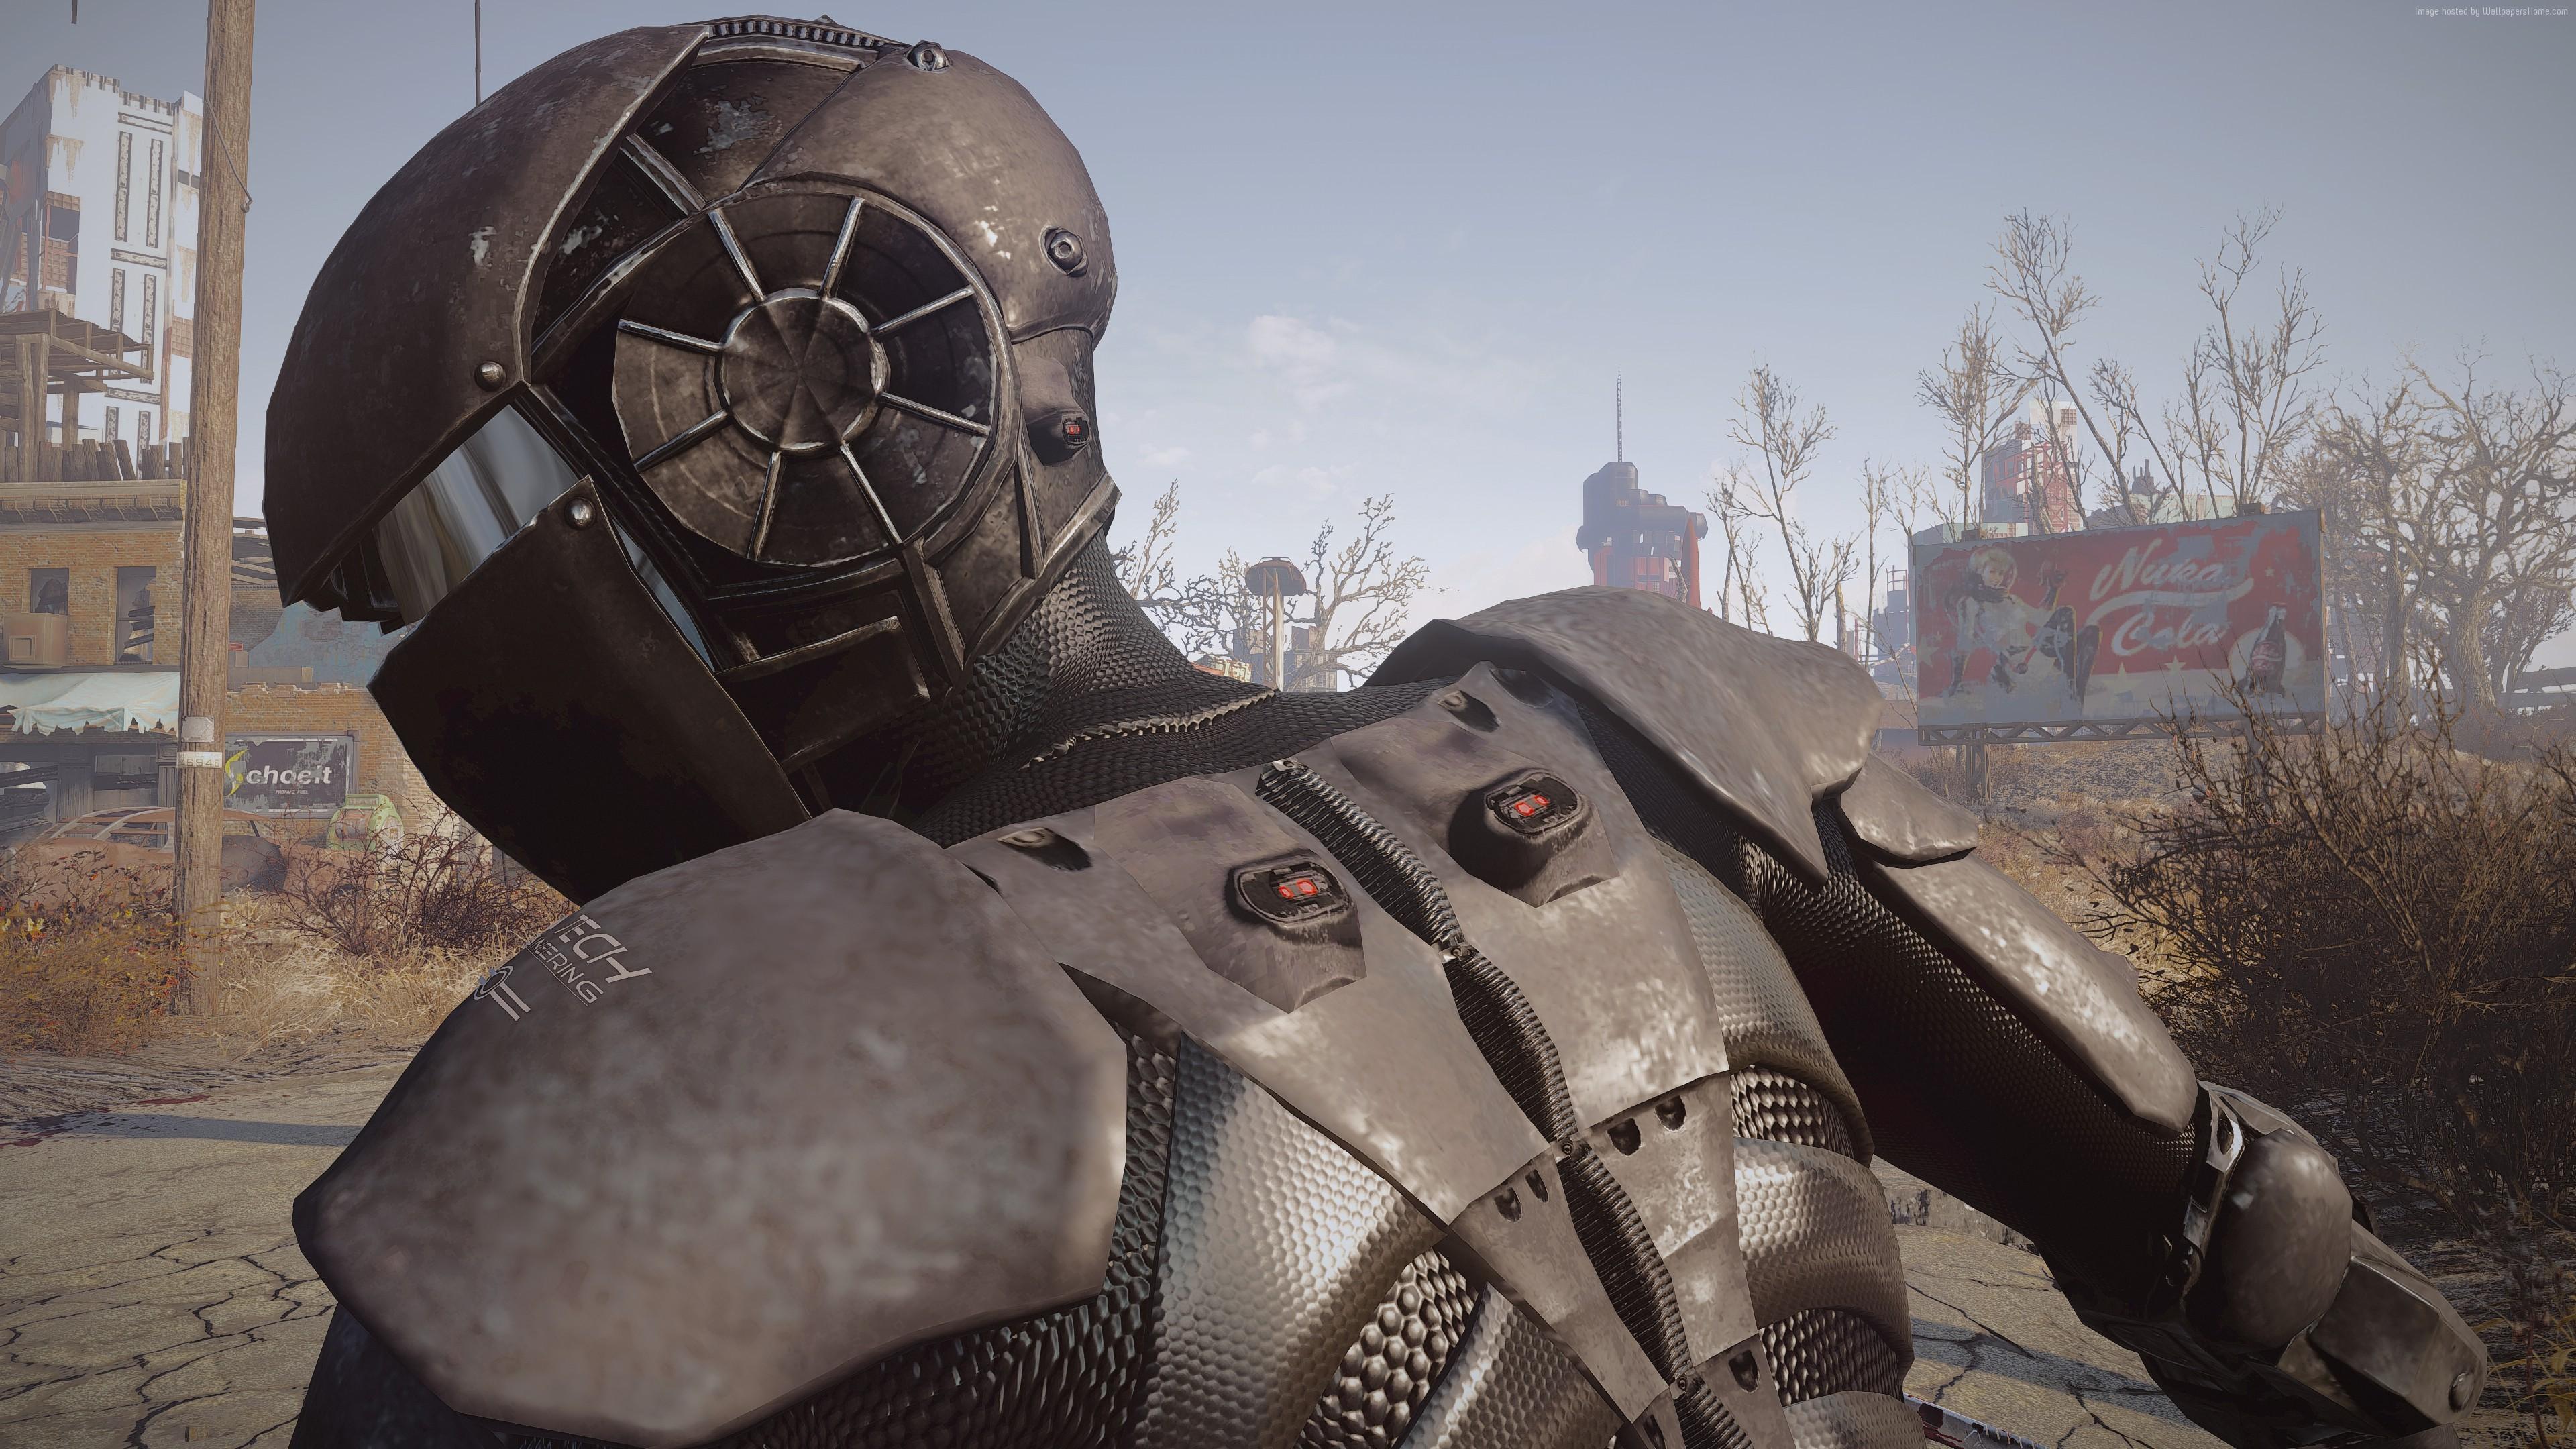 fallout-4-3840x2160-nexus-mod-best-games-2016-game-shooter-pc-ps4-10967.jpg - Fallout 4